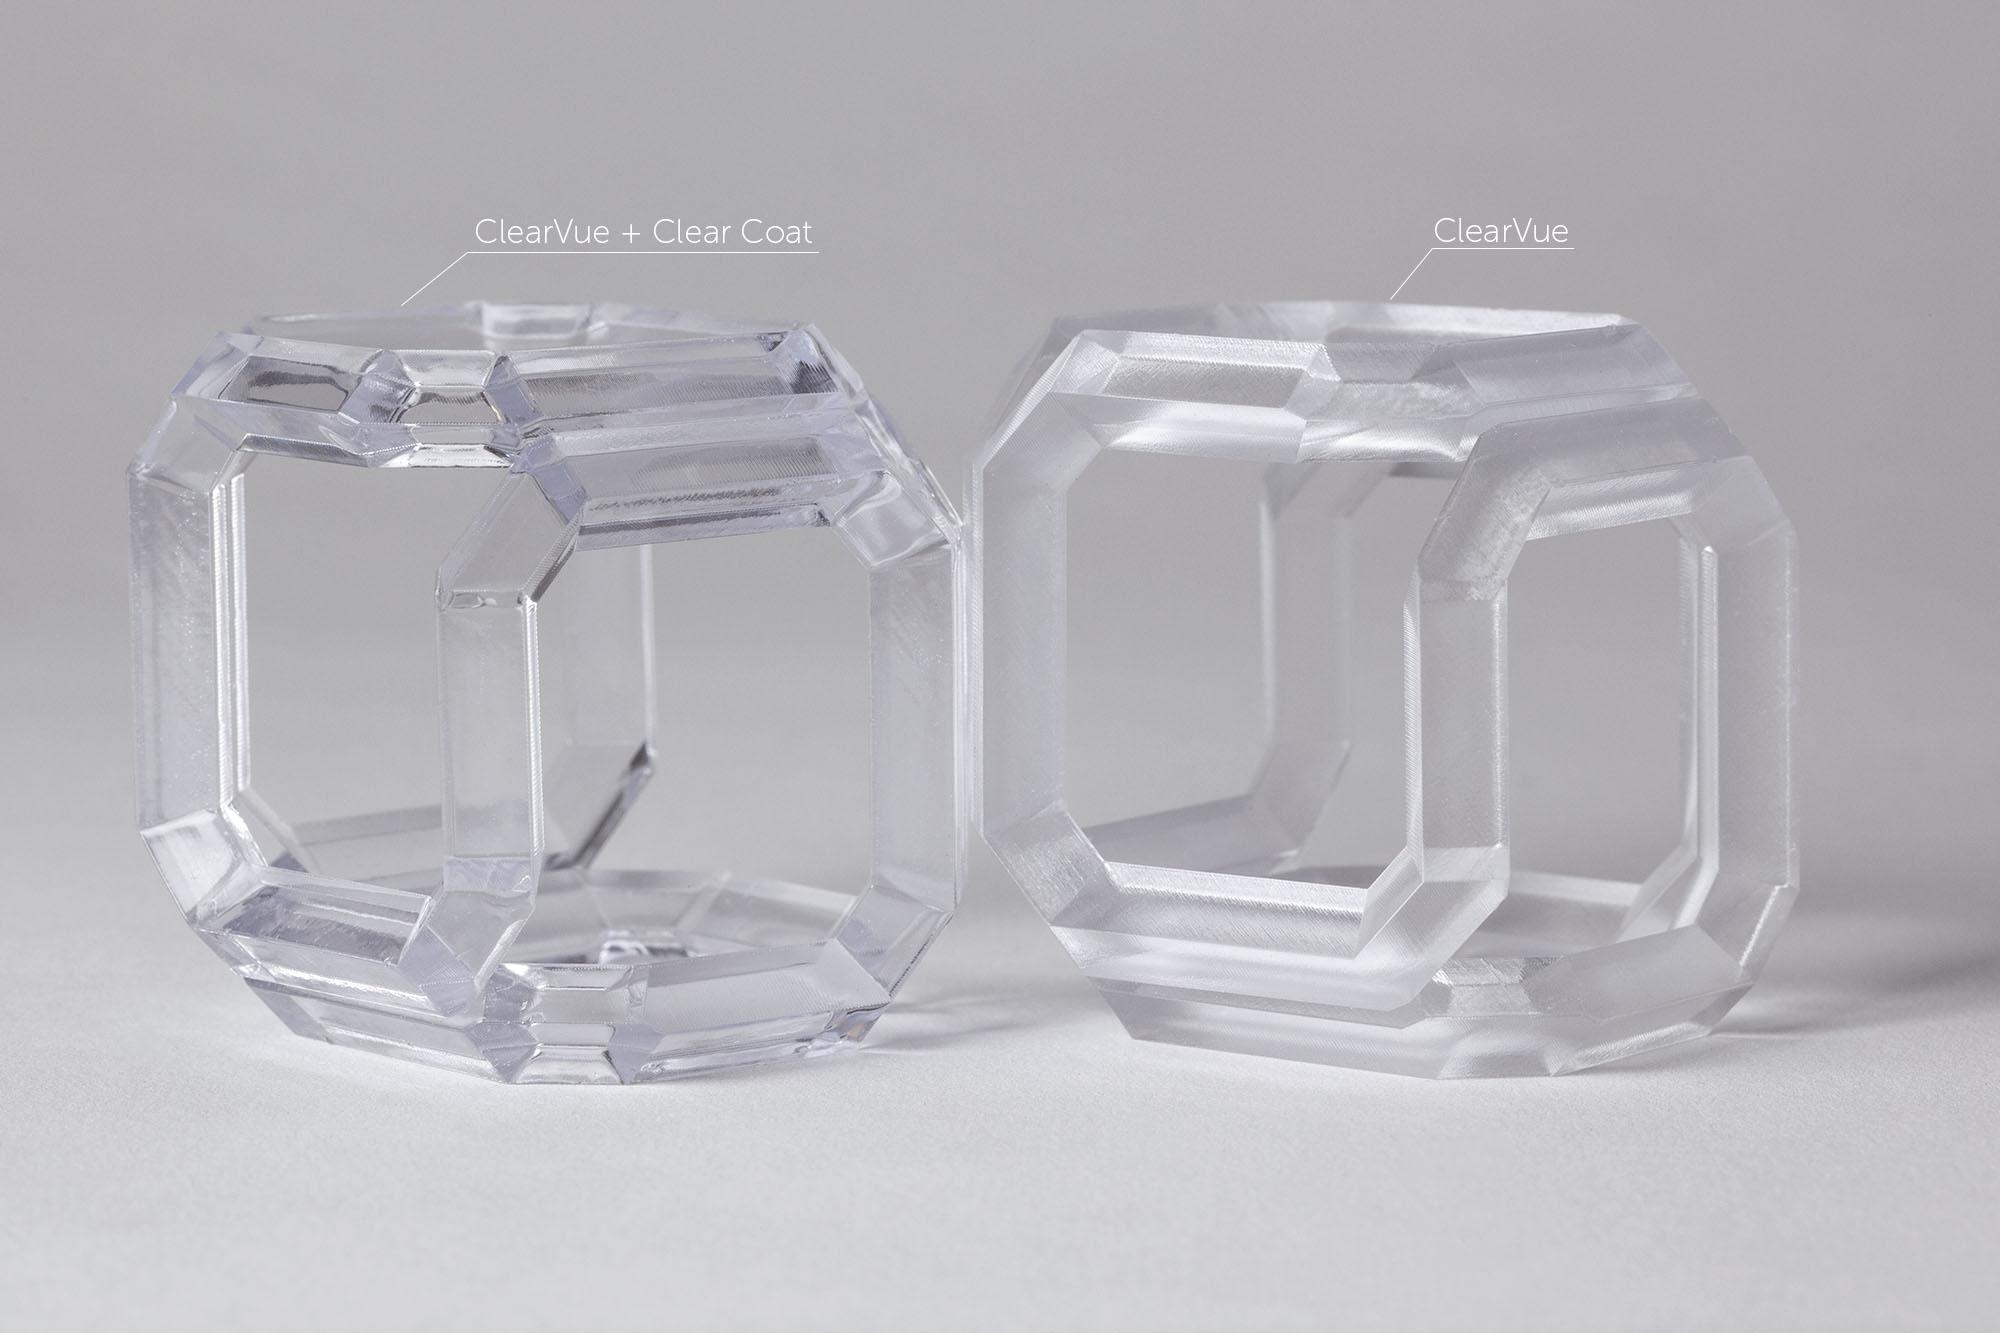 Accura Clearvue SLA 3d printing material